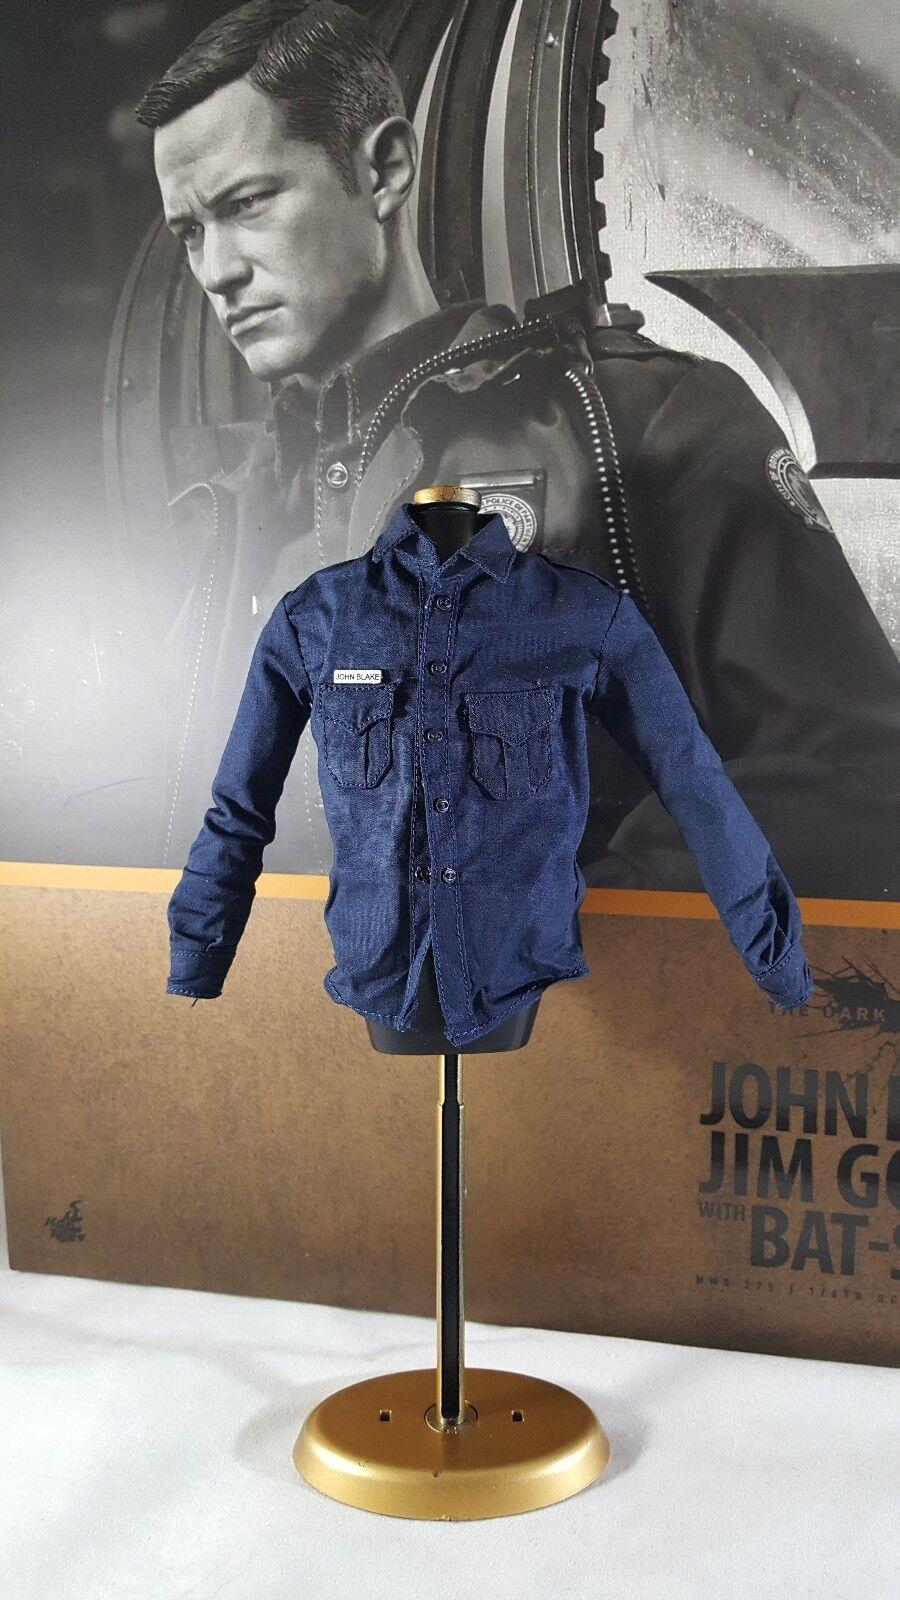 Hot Toys MMS275 MMS275 MMS275 Batman 1 6 John Blake action figure's police uniform shirt only 150994